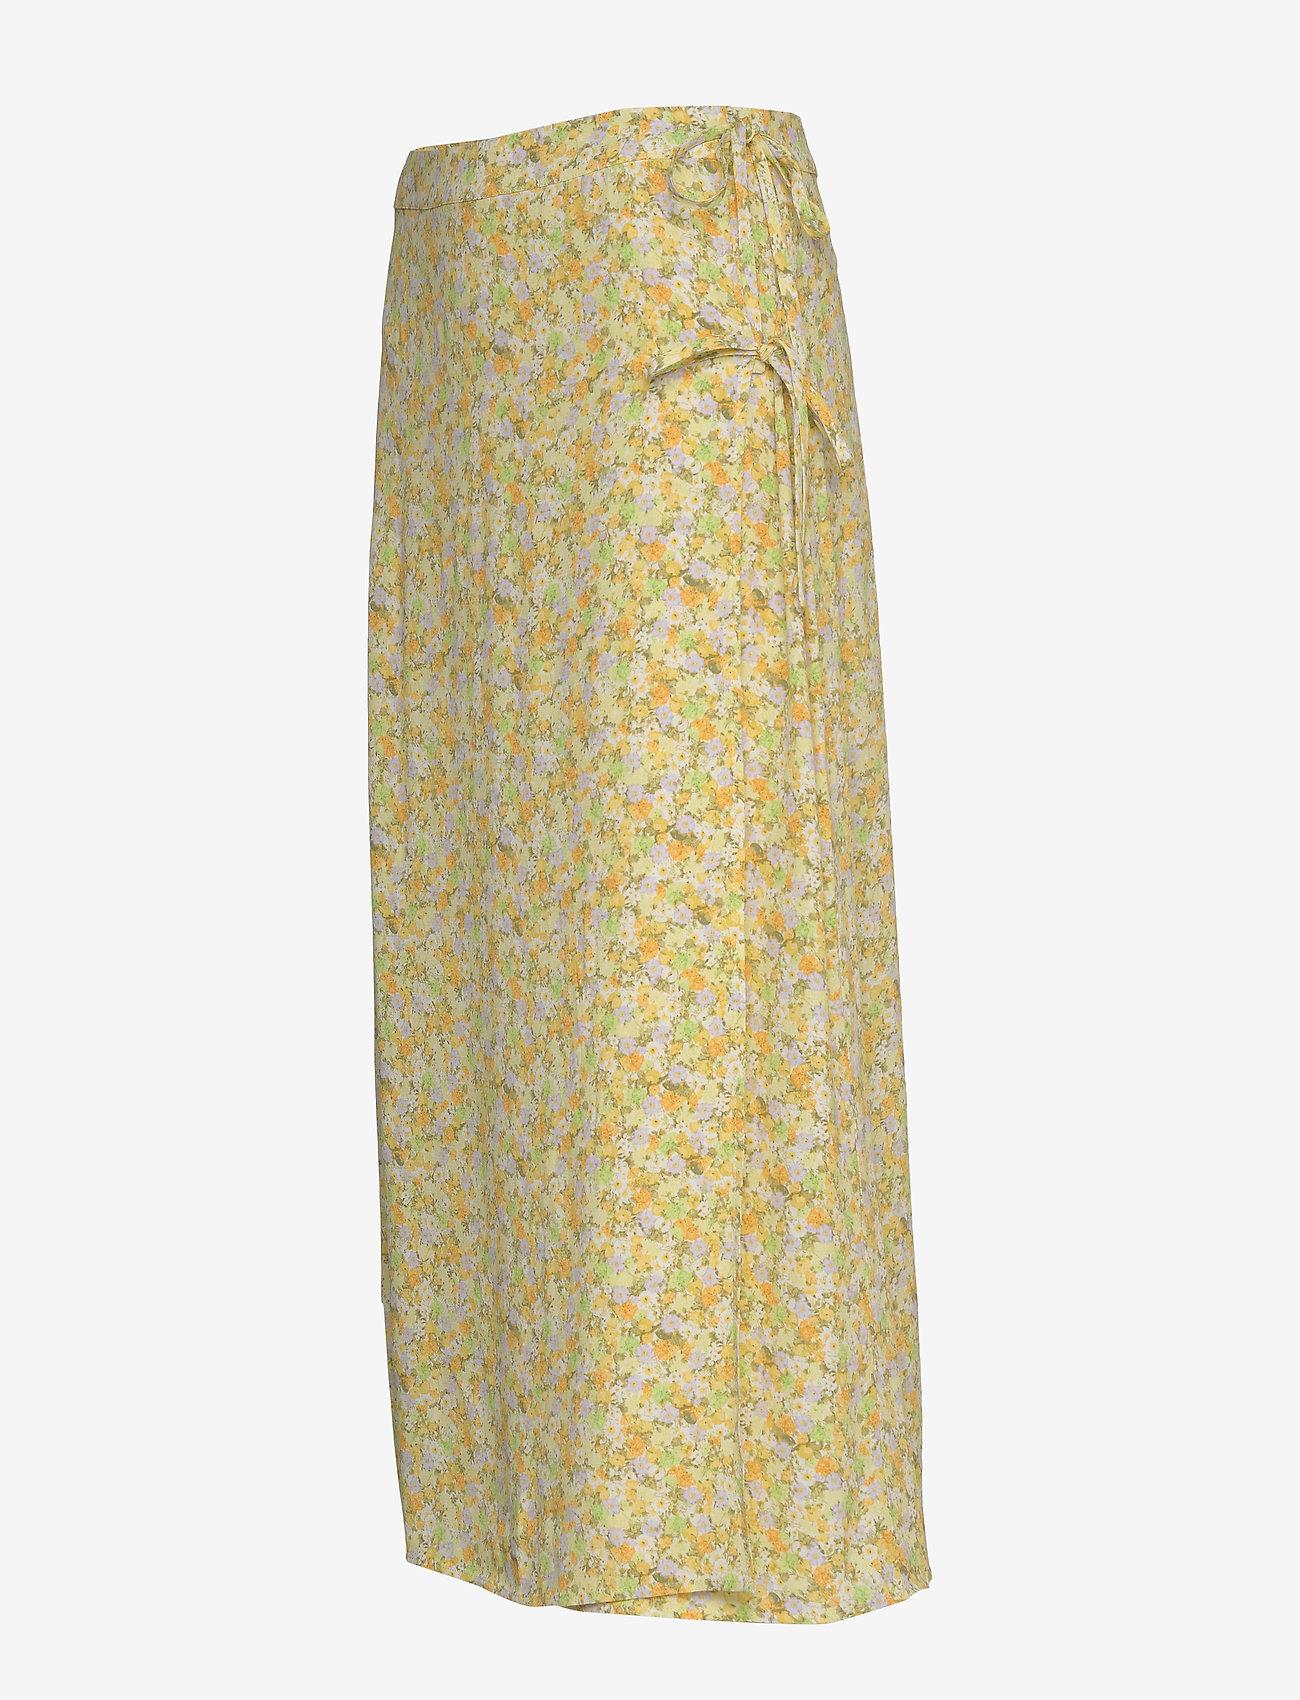 Encornelia Skirt Aop 6696 (Wateredge Flower) (384 kr) - Envii